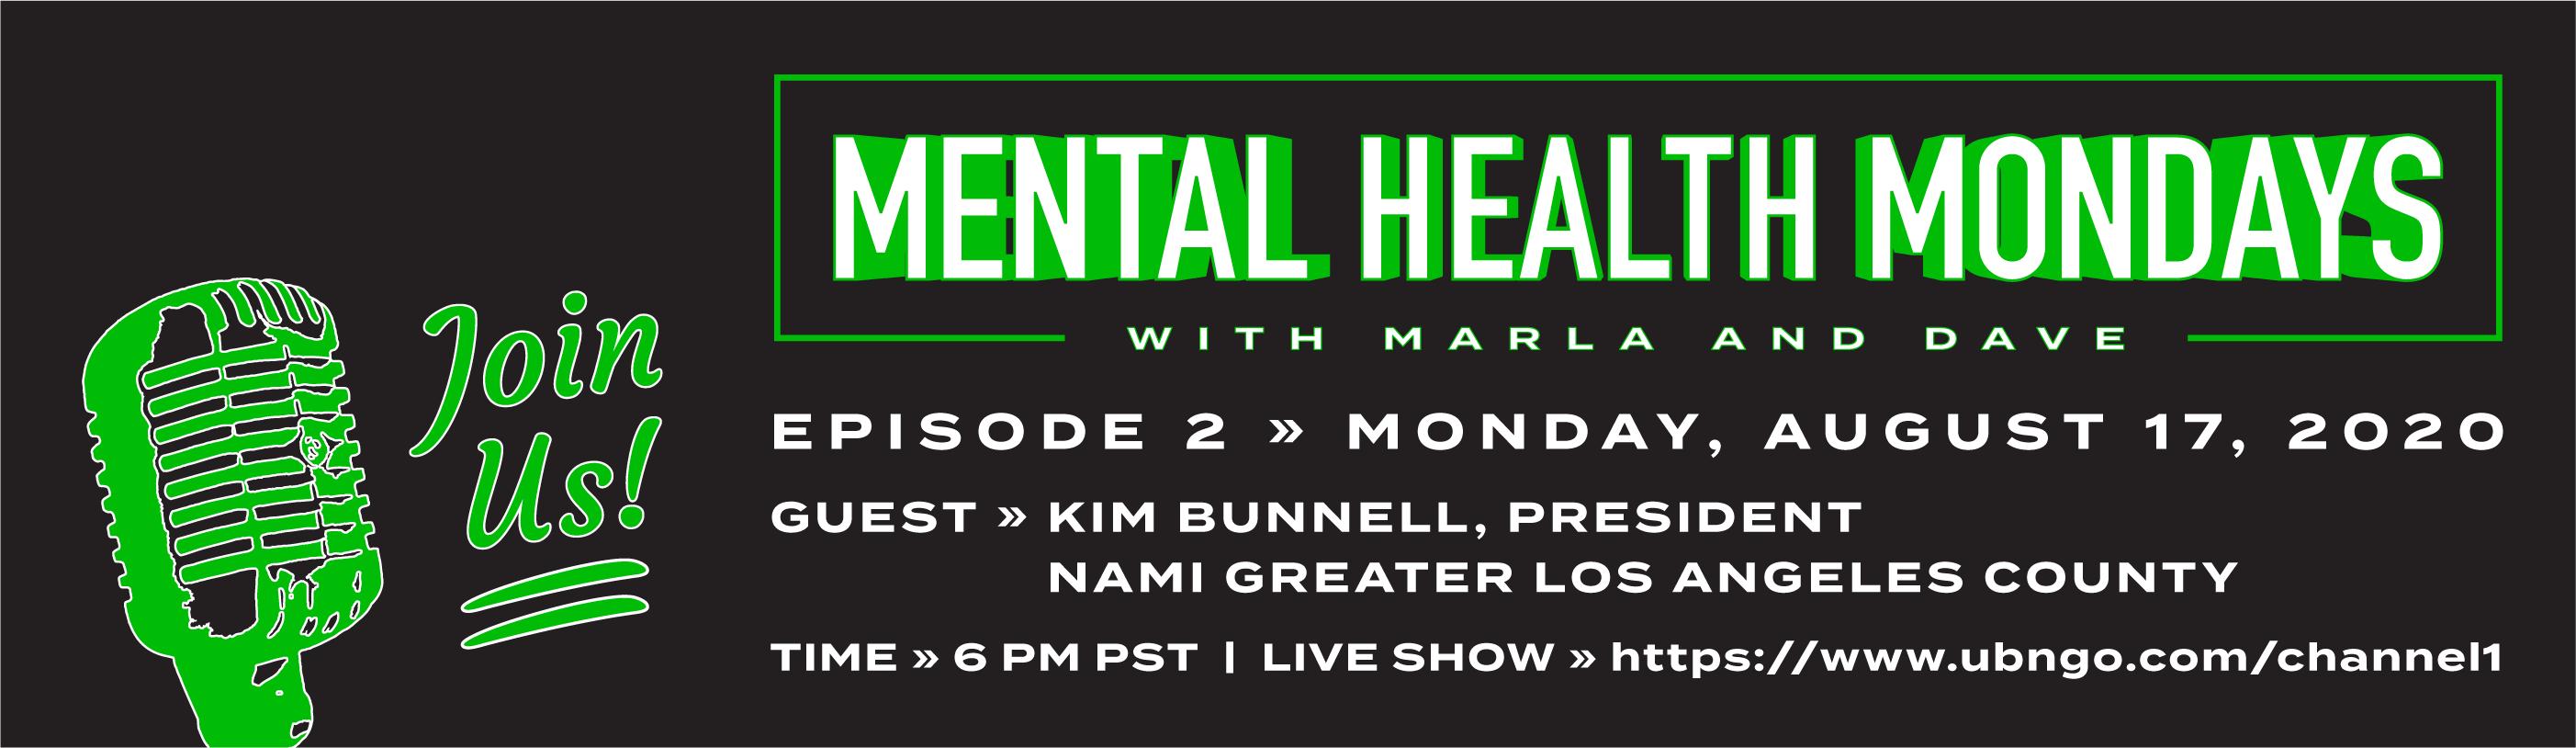 Mental_Health_Mondays_Homepage_Slider_E2.png